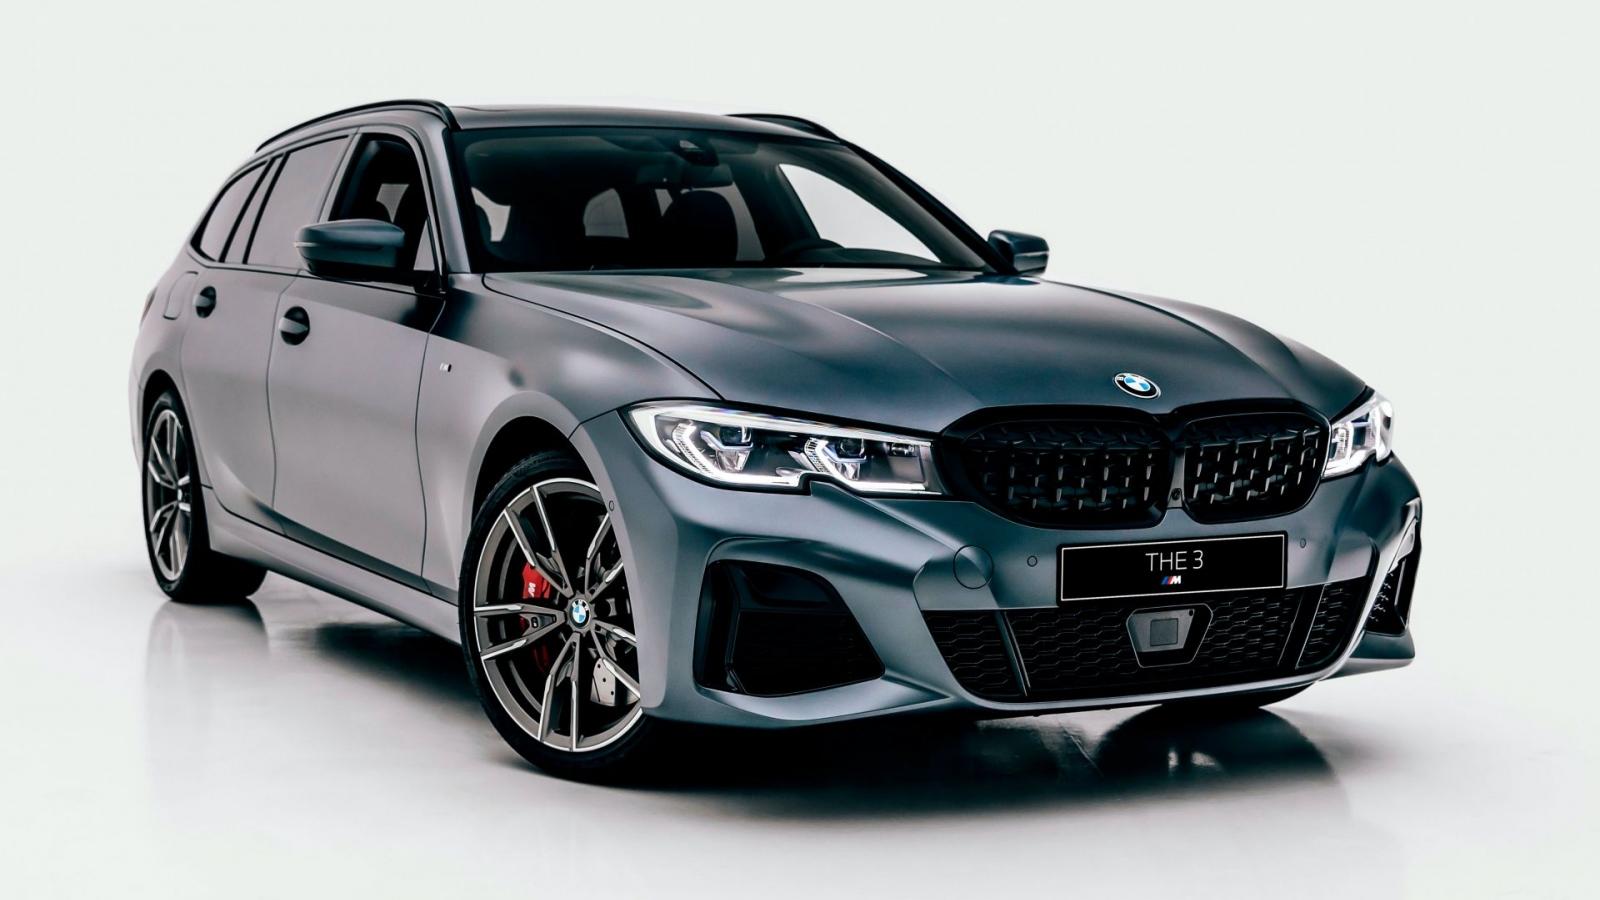 Hơn 50.000 xe BMW bị triệu hồi do lỗi phanh